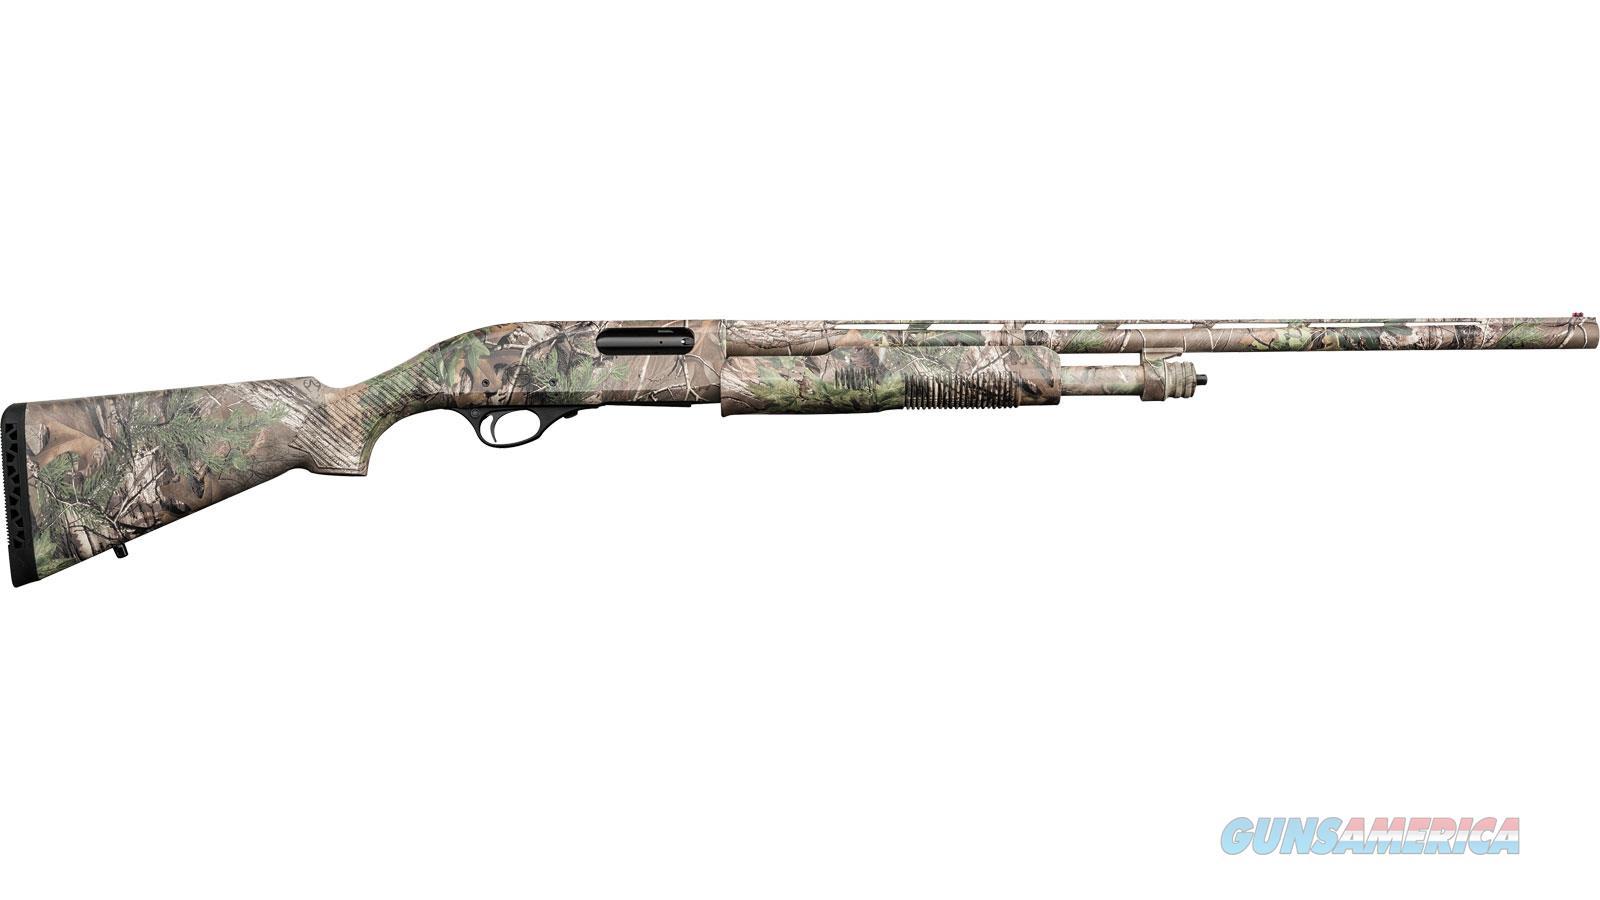 "Chiappa Firearmsmks C6 20G 26"" 5Rd 930.067  Guns > Shotguns > C Misc Shotguns"